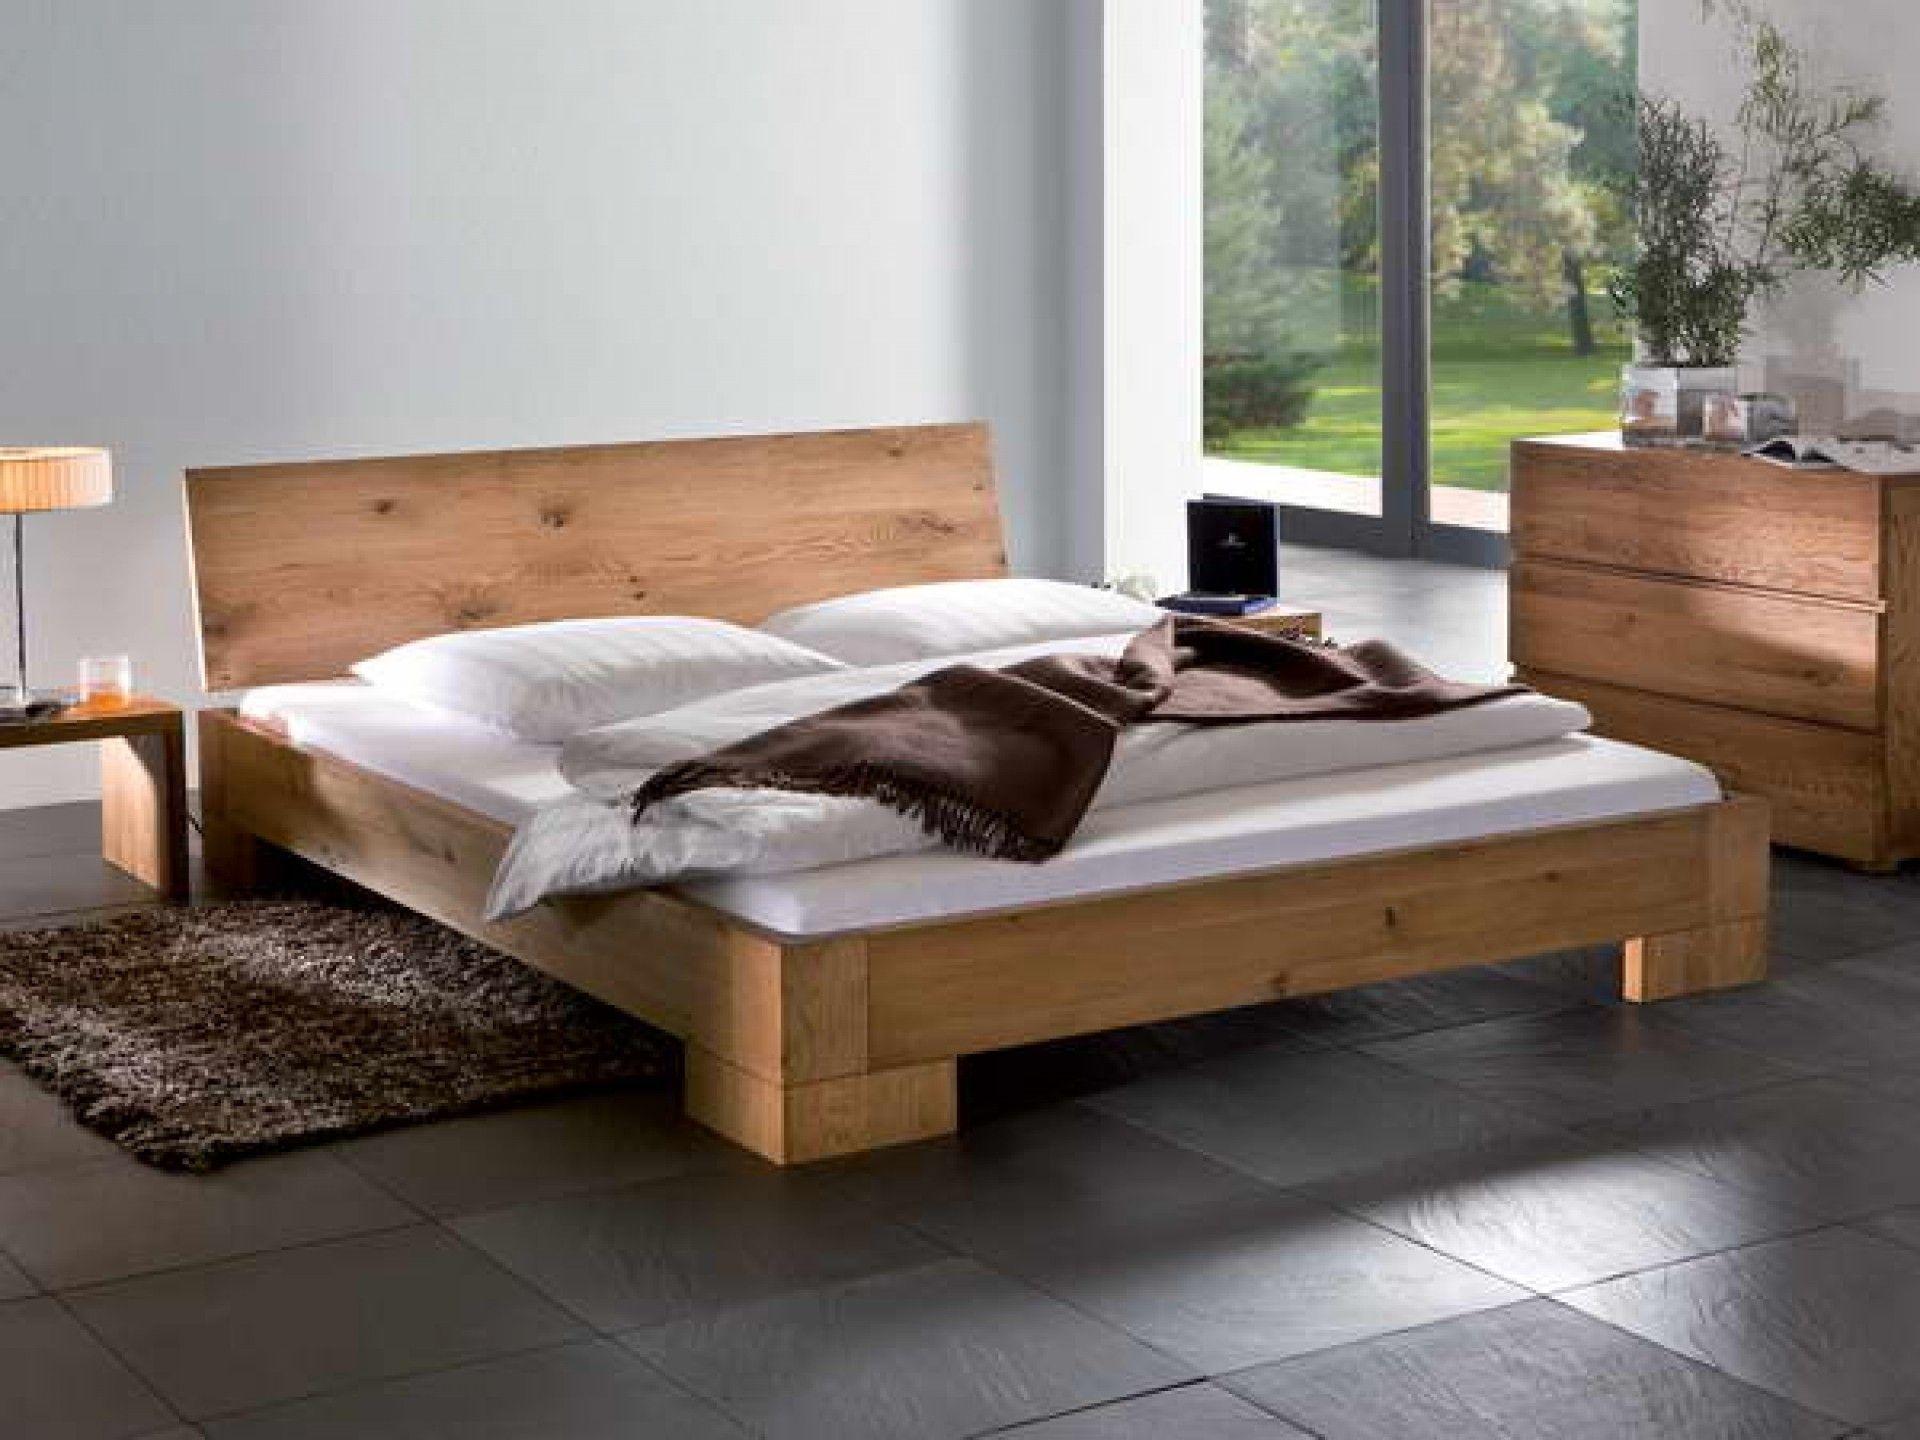 doppelbett gestell mit schubladen unter dem bett rahmen. Black Bedroom Furniture Sets. Home Design Ideas